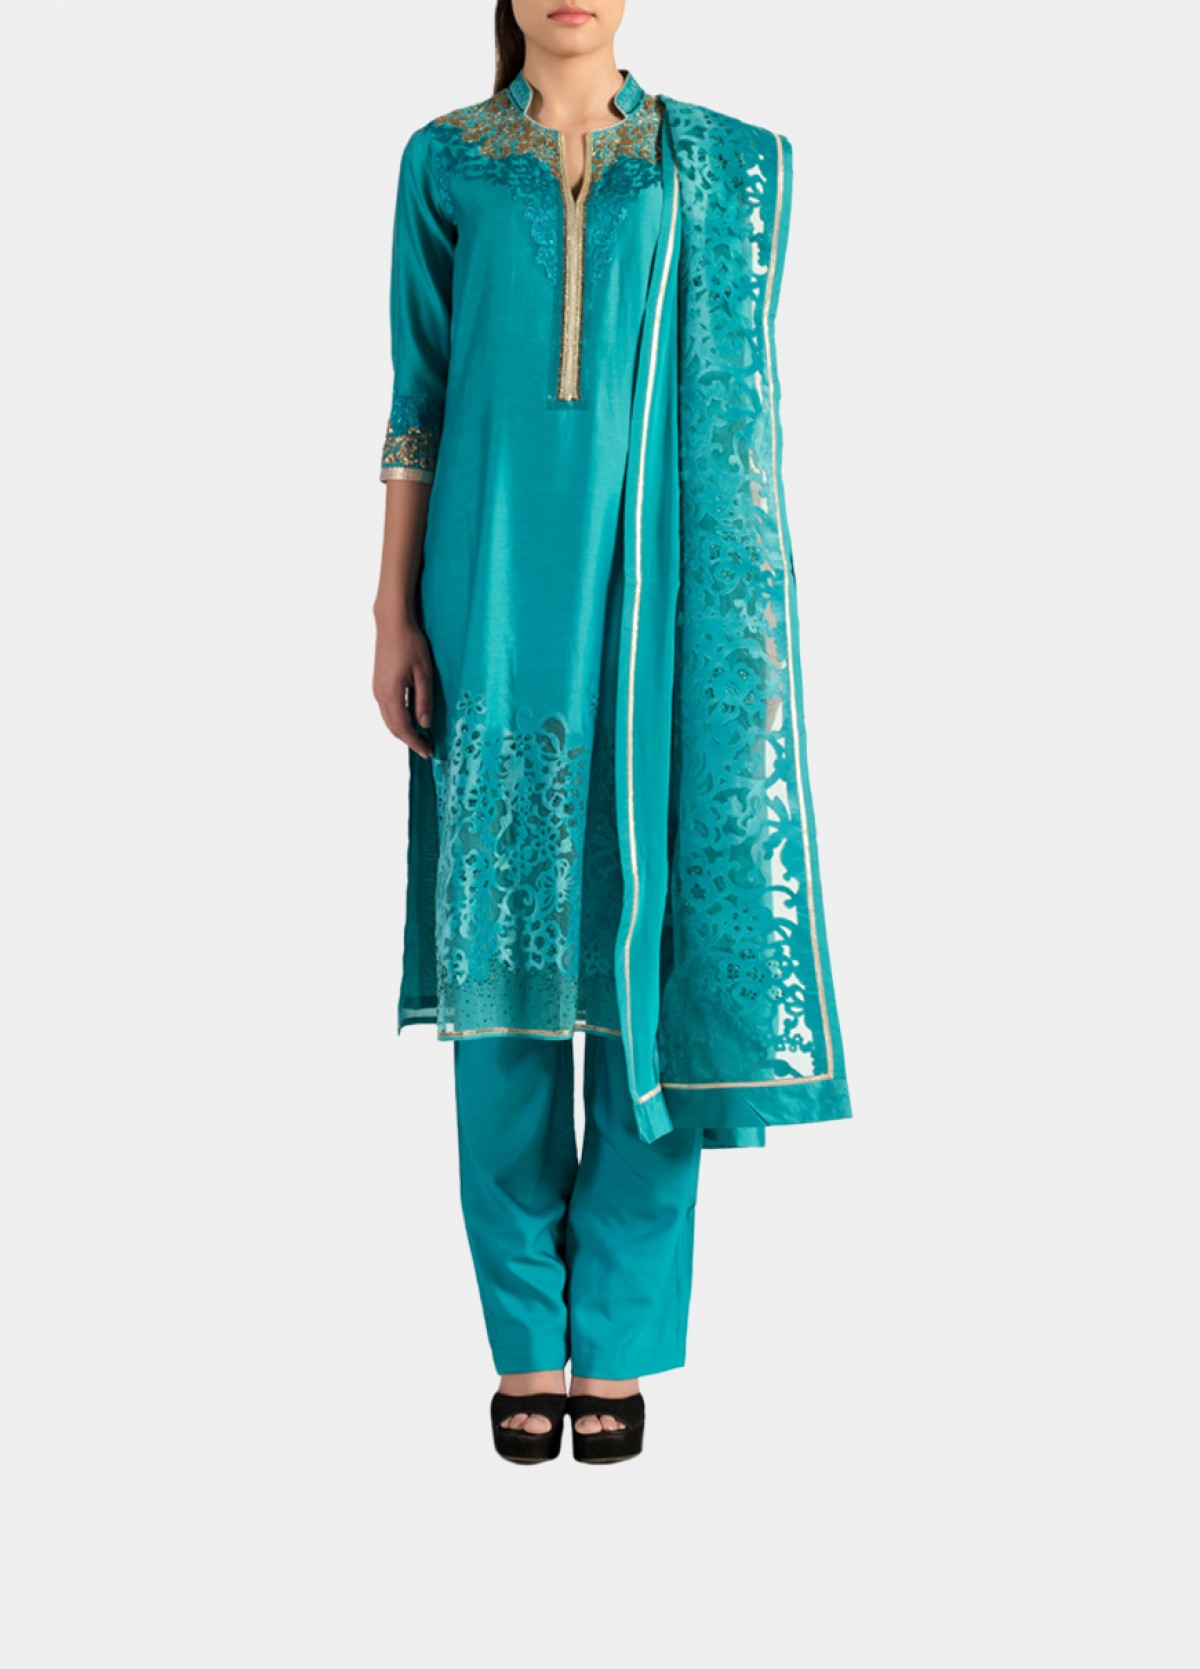 The Straight Cut Embroidered Suit Kurta Bottom Dupatta Set